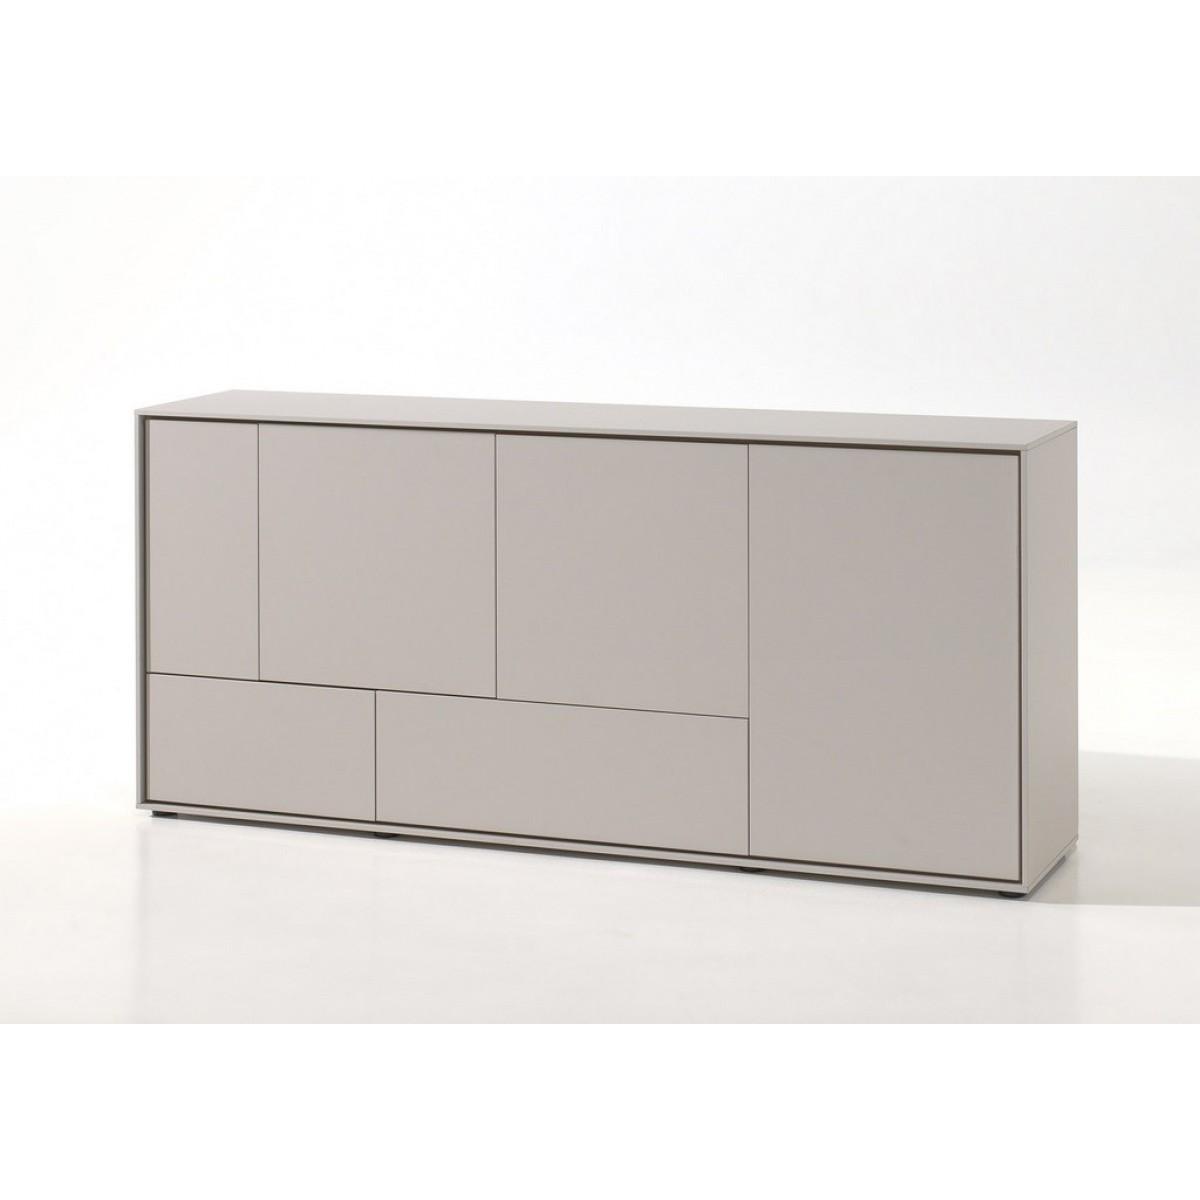 kyara-dressoir-dressette-c0052e-cashmere